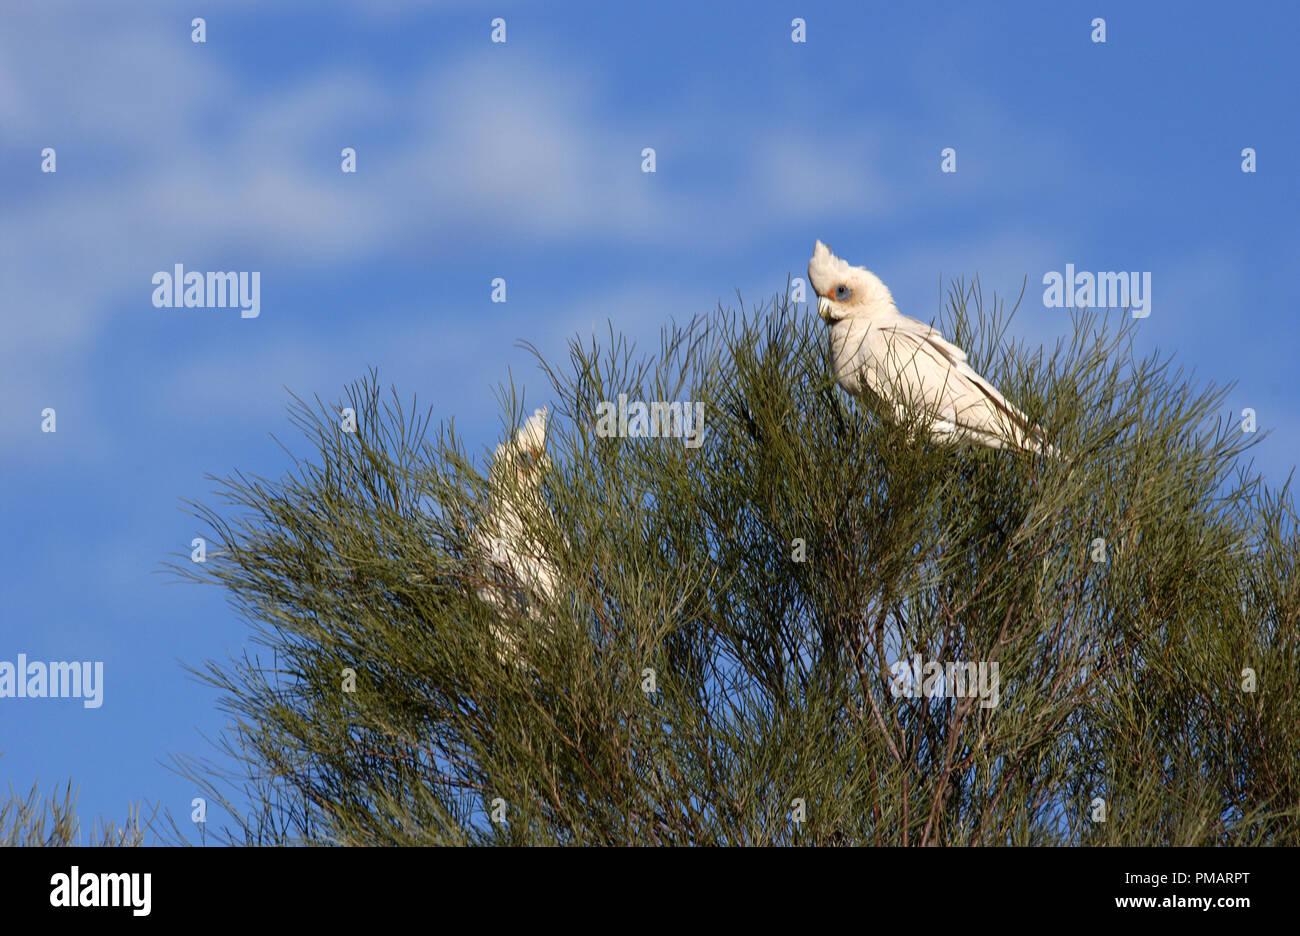 Little corellas (Cacatua sanguinea) perched in a tree in outback Western Australia. - Stock Image